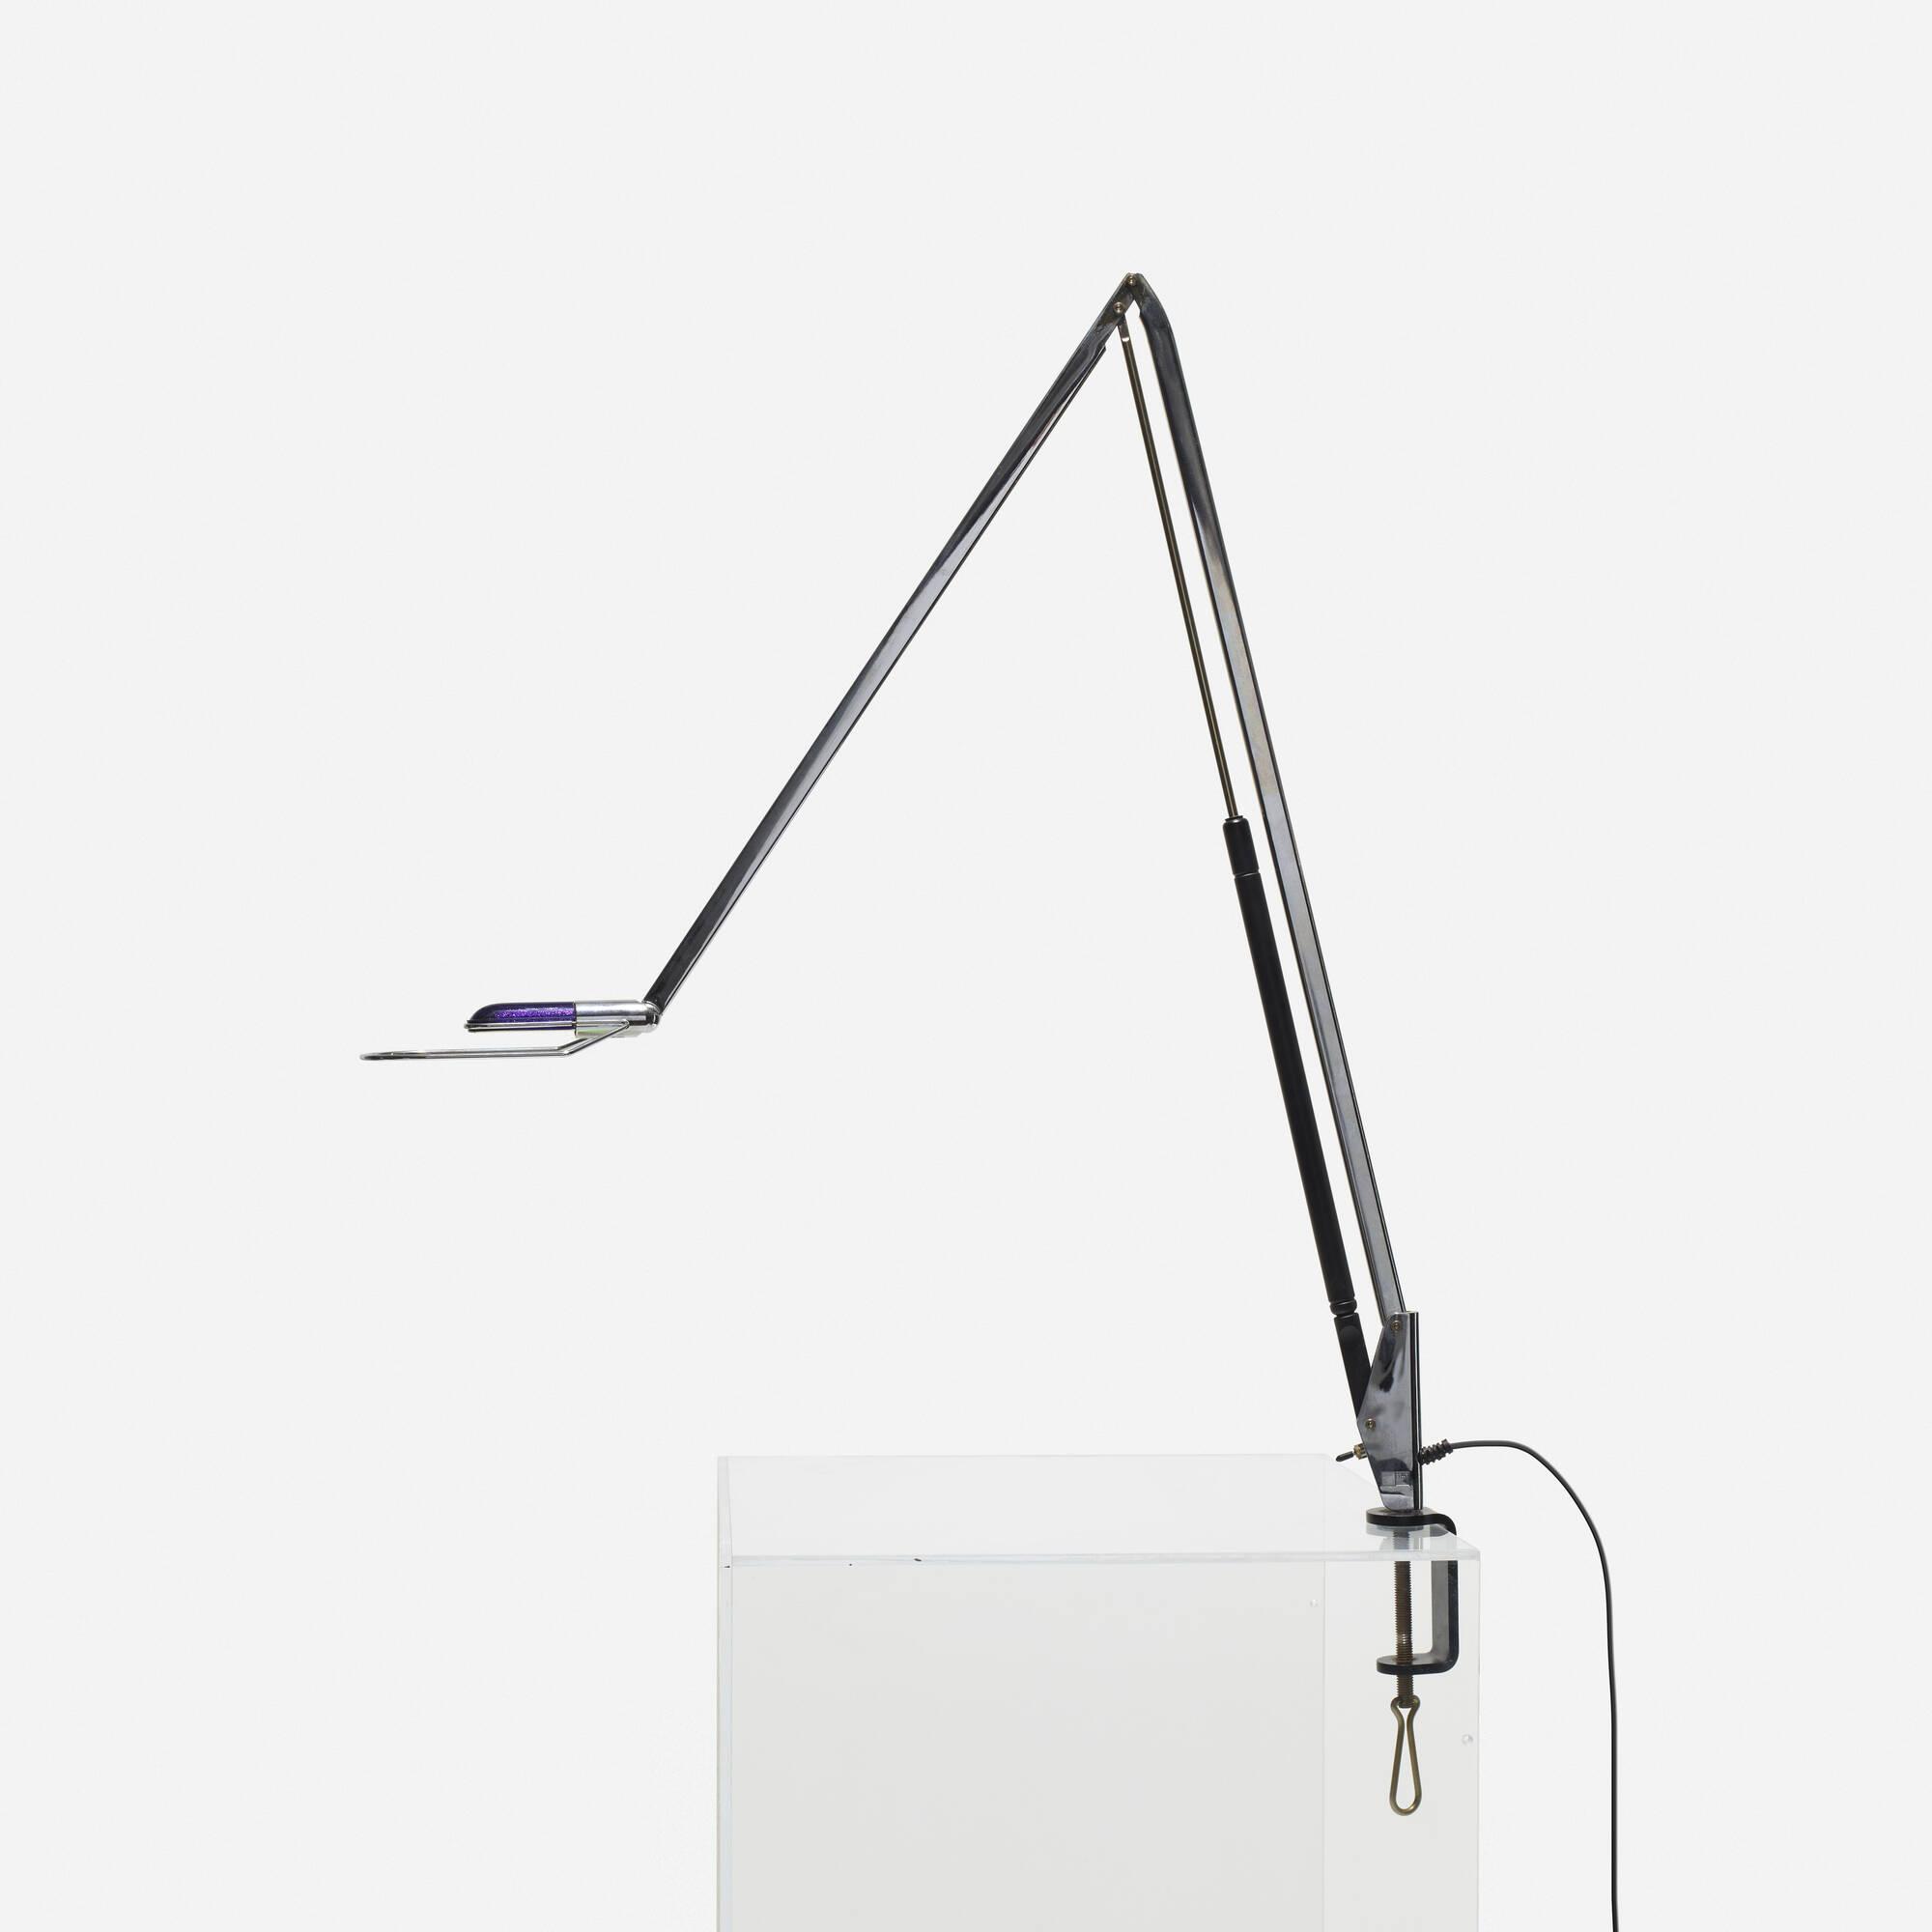 463: Benjamin Thut / Lifto vise lamp (1 of 2)